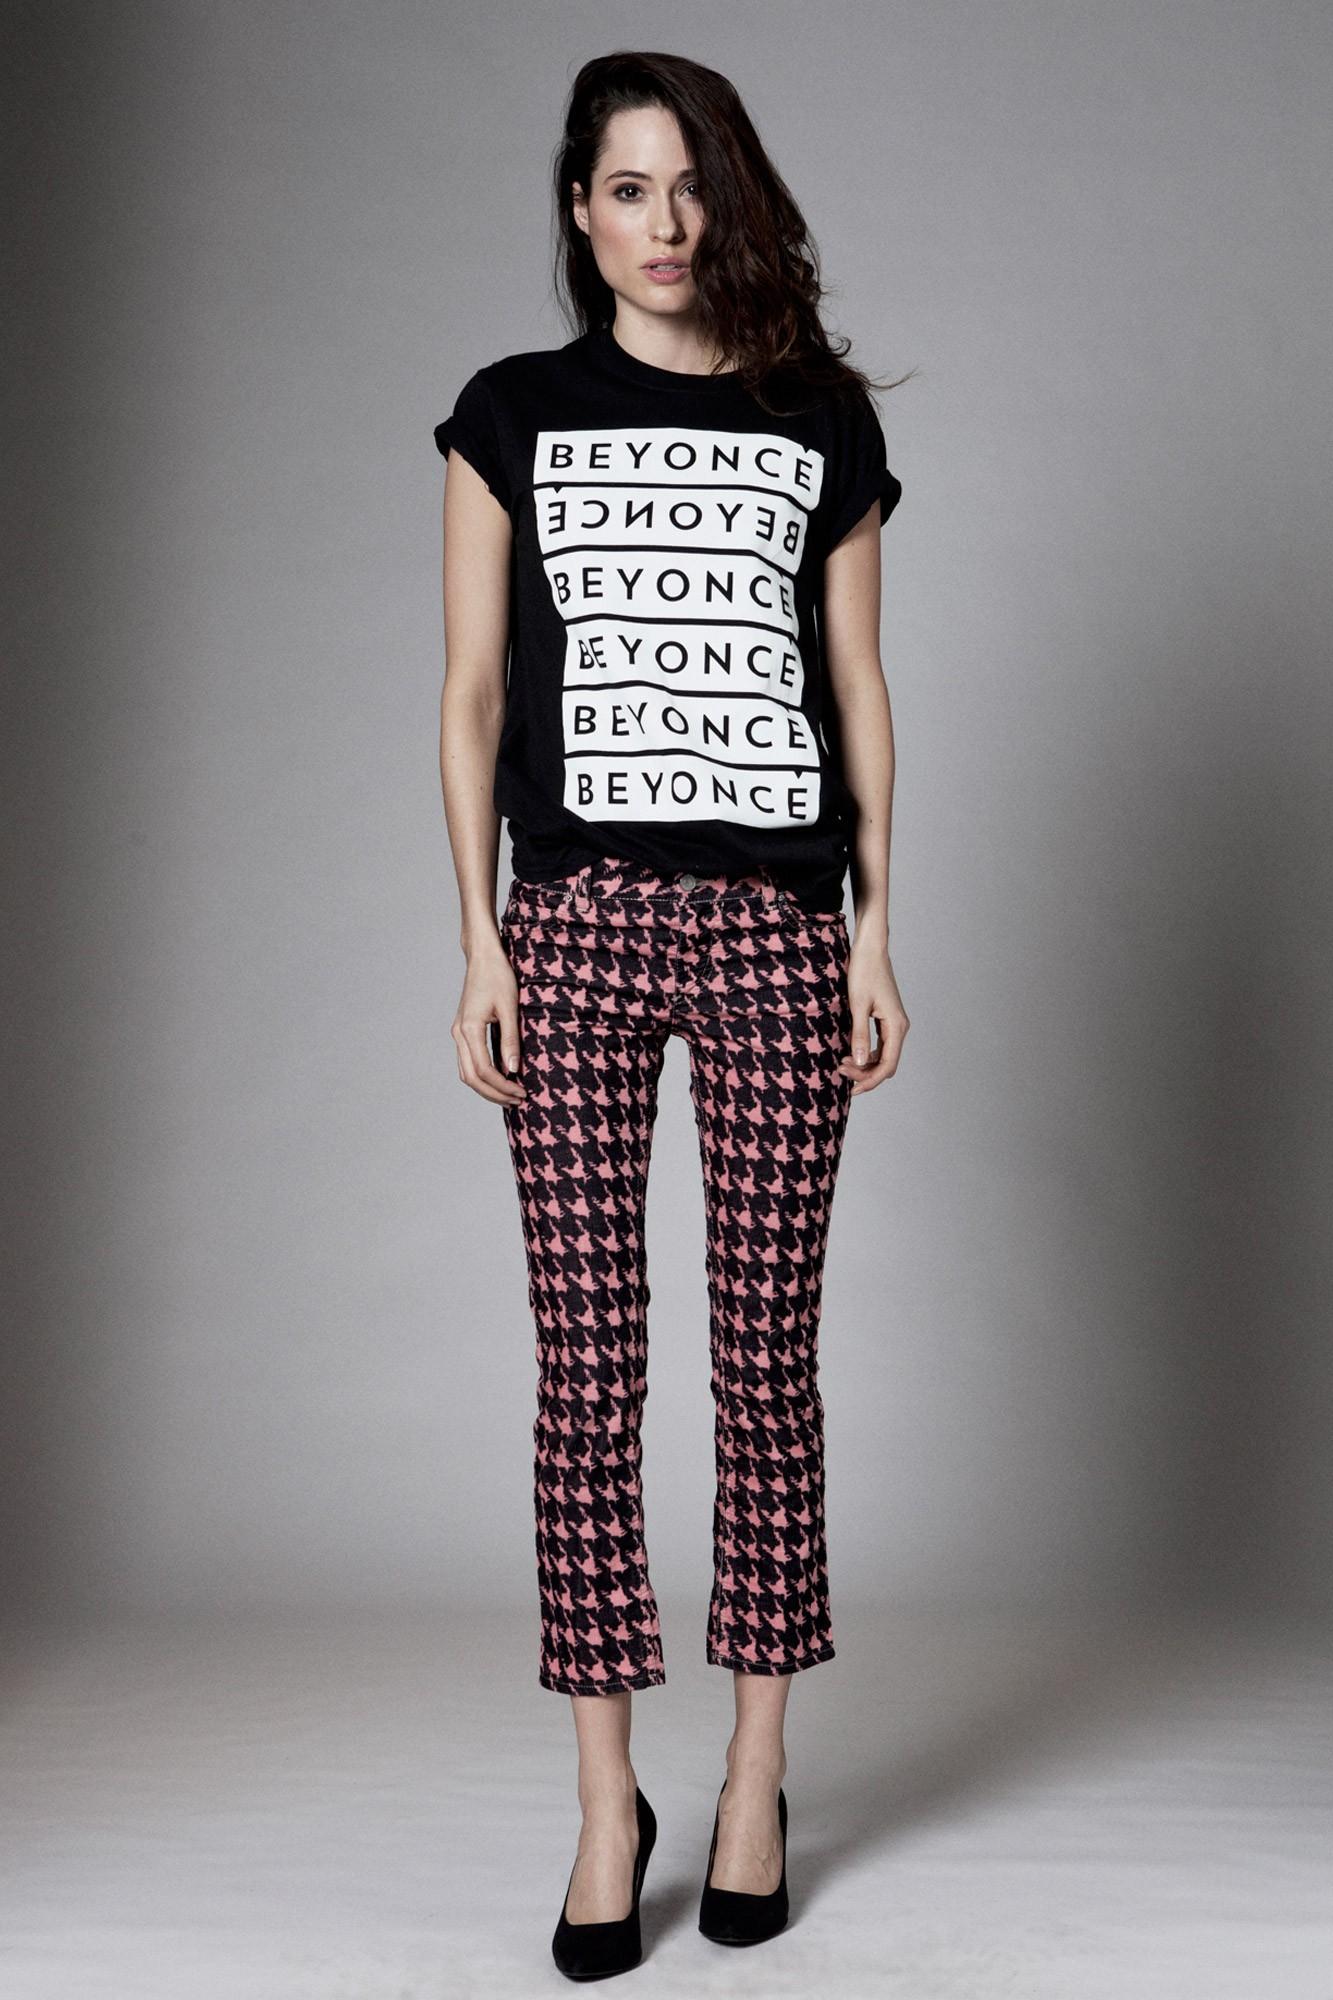 beyonce-repeat-logo-tee